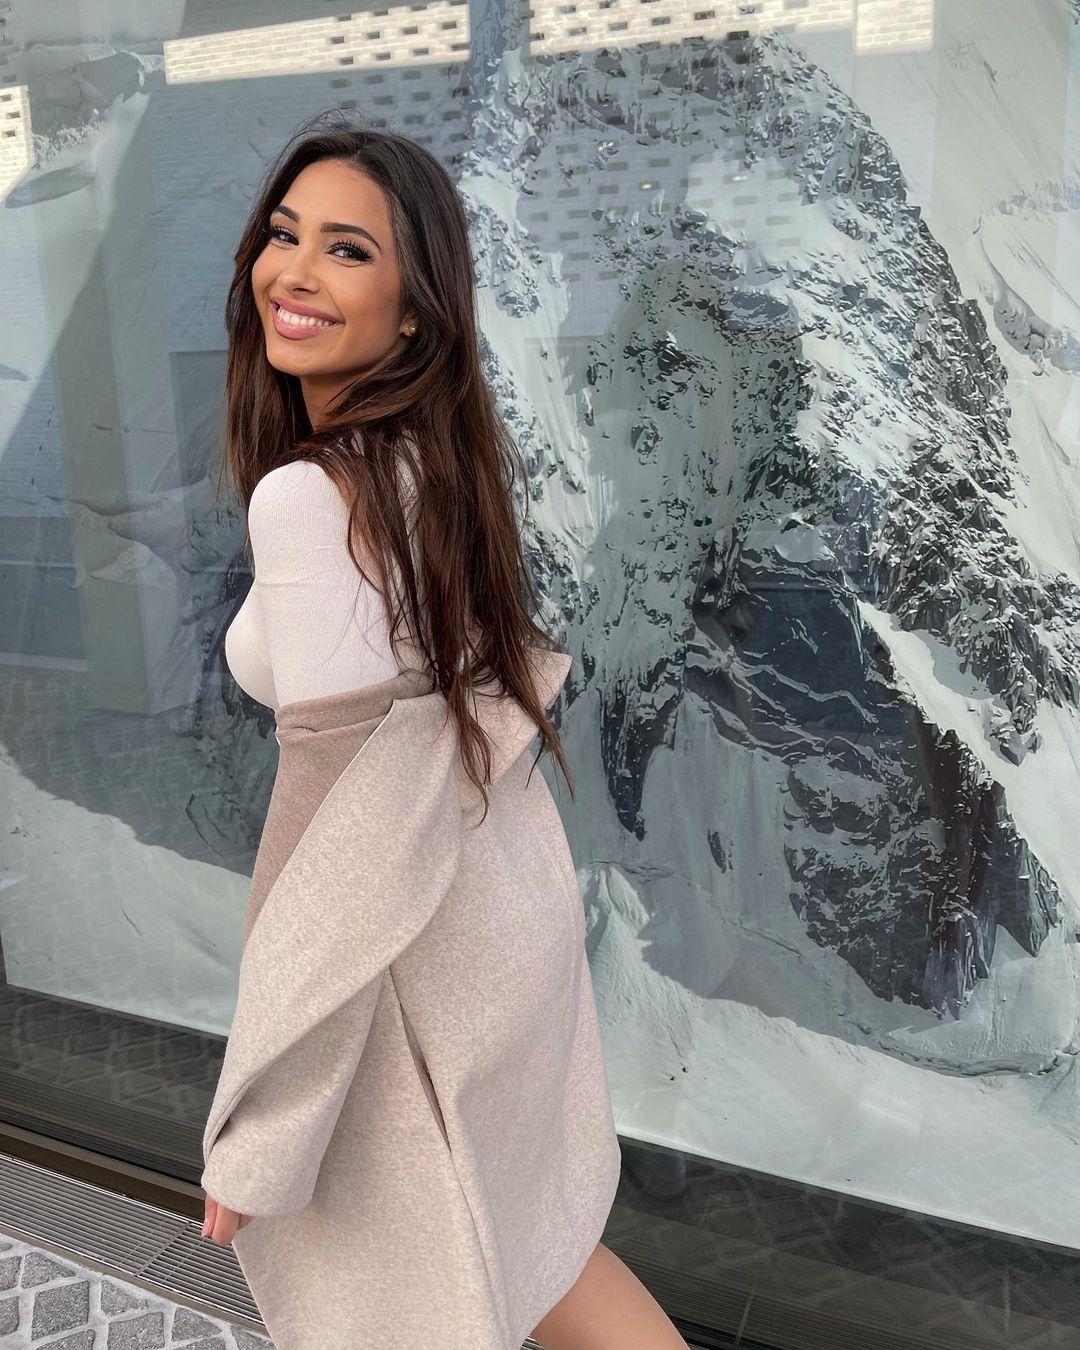 Celine-Lara-Sophie-Wallpapers-Insta-Fit-Bio-Celine-Bretz-Wallpapers-Insta-Fit-Bio-2